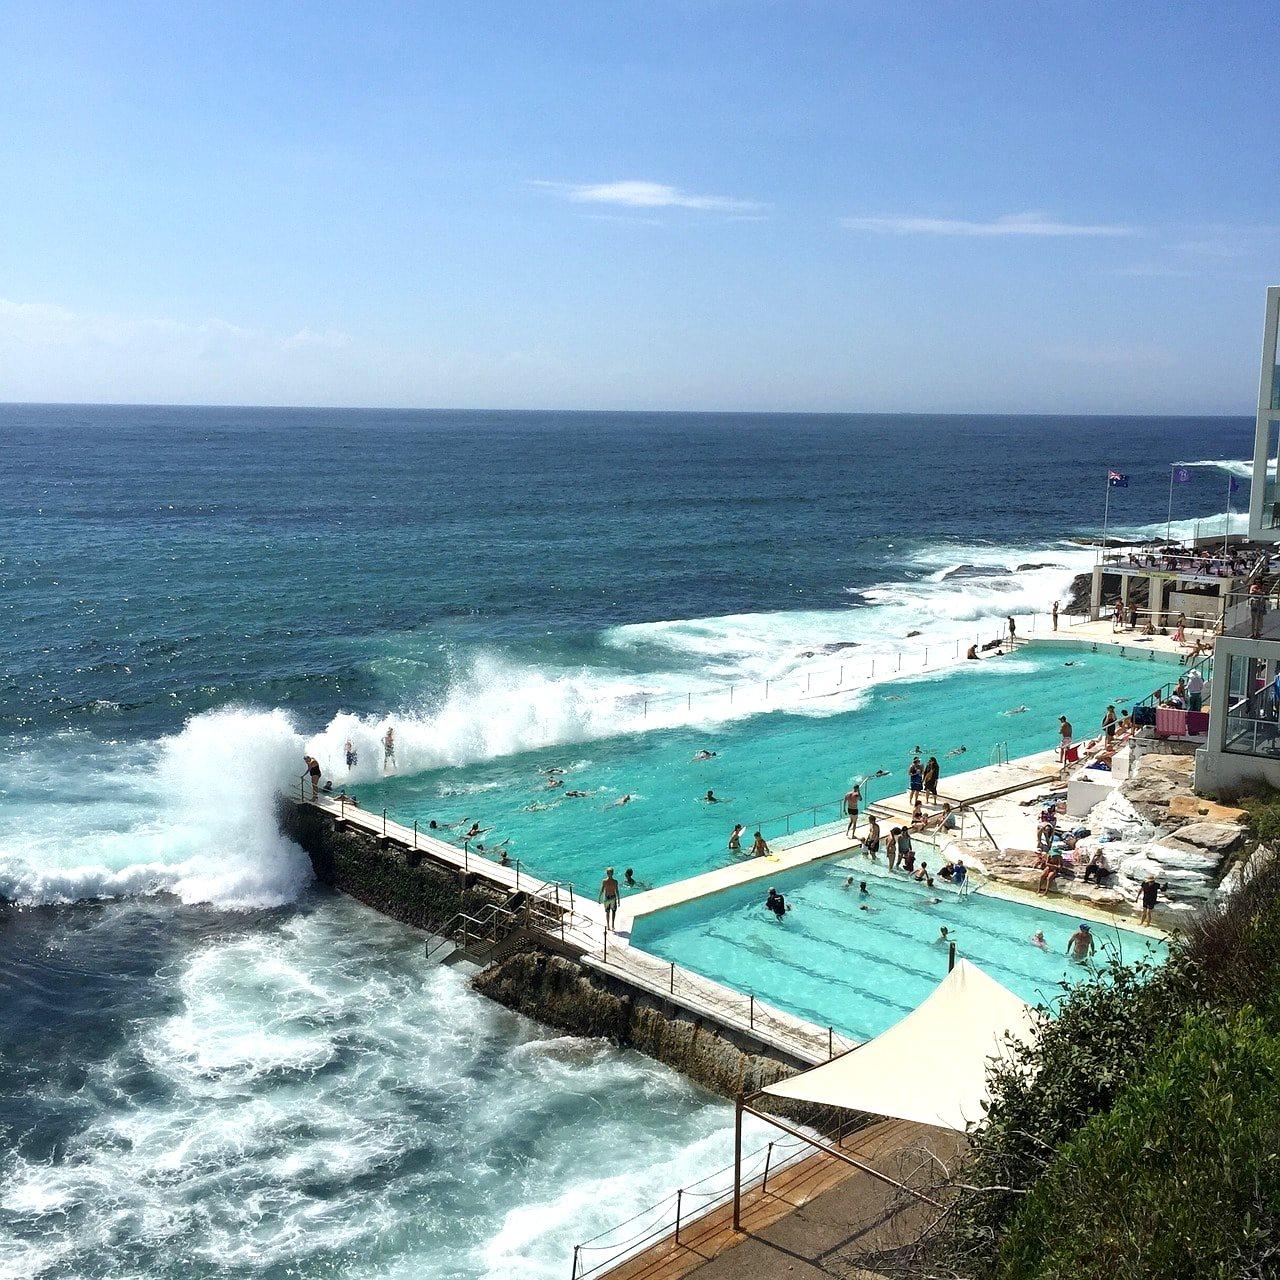 Sydney, Australia, Bondi Icebergs Club